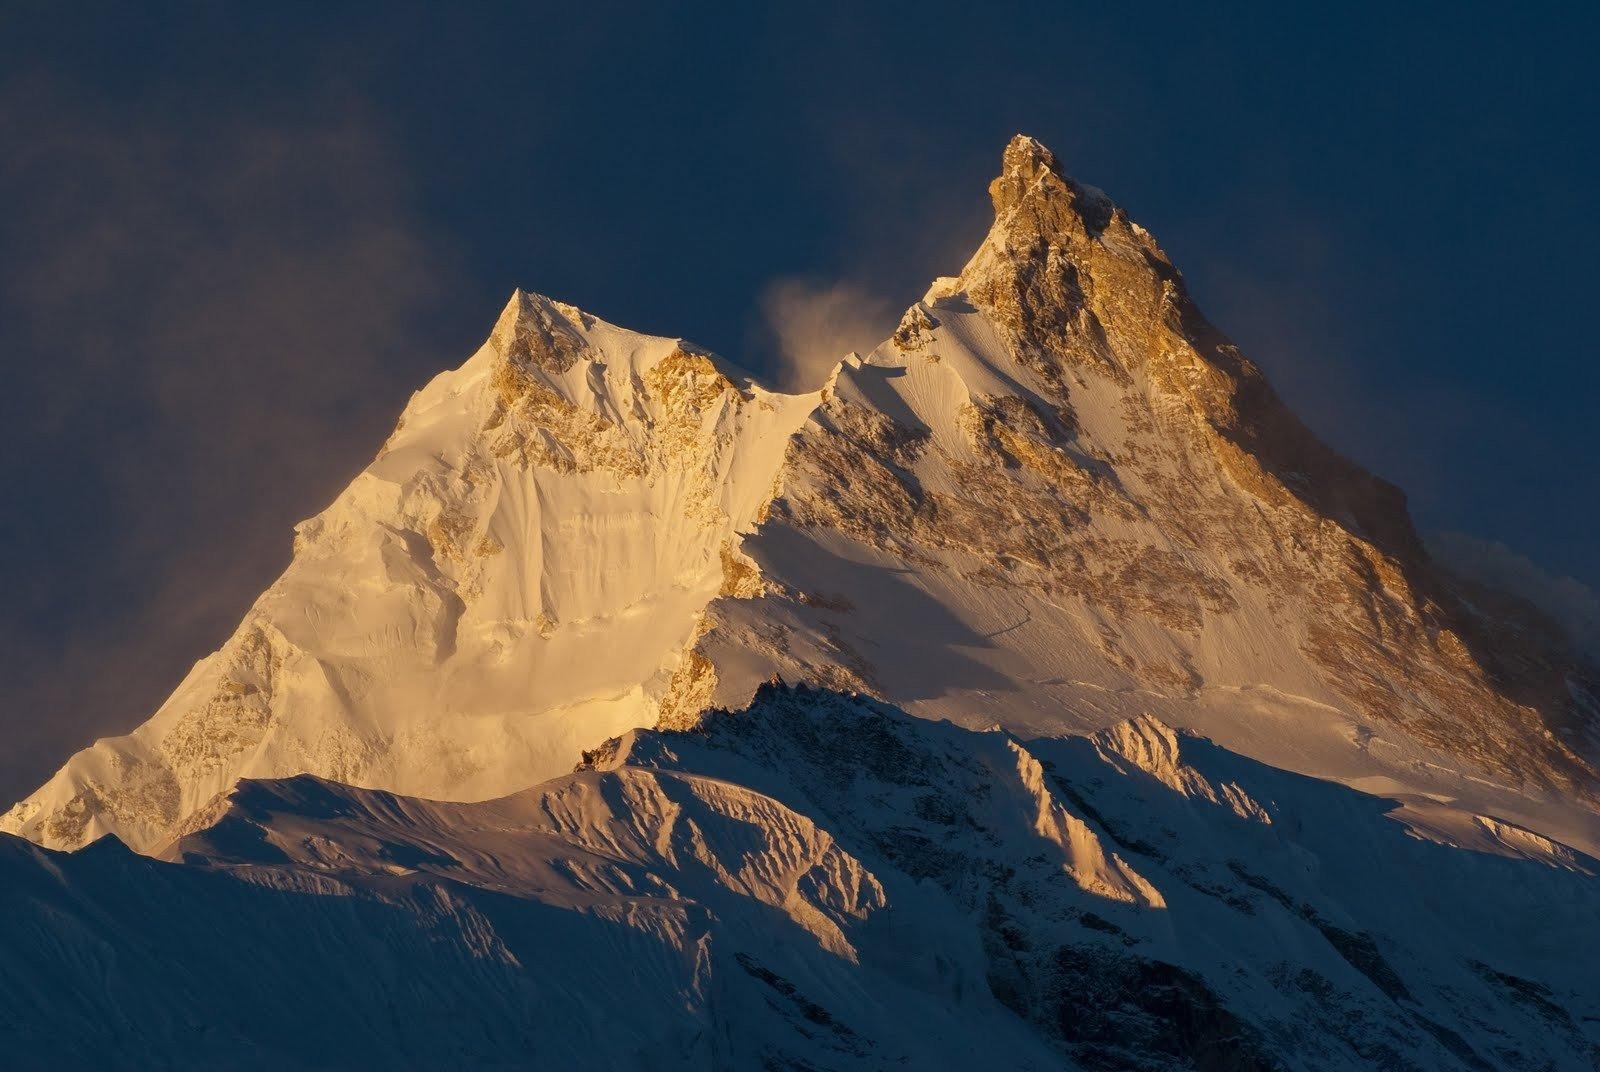 Nepal himalayas manaslu mountain hd wallpapers - Himalaya pictures wallpaper ...